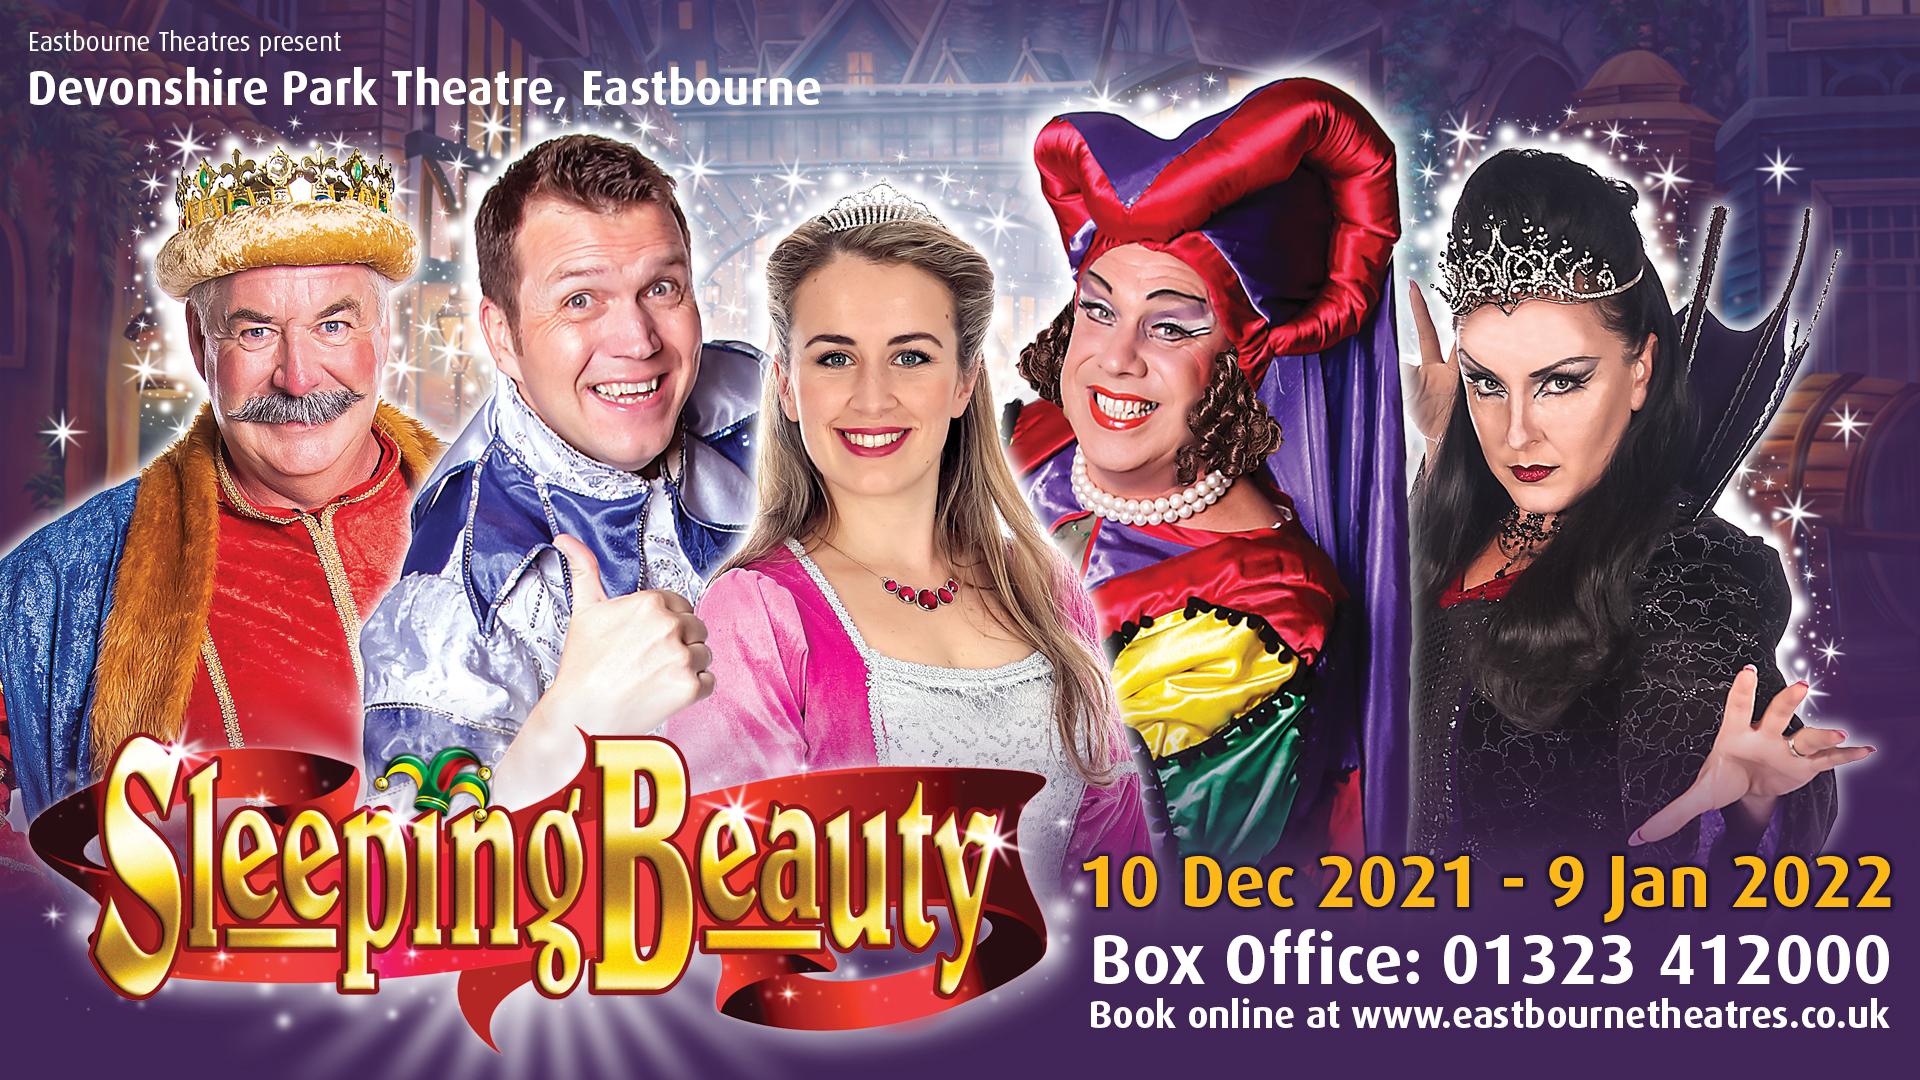 Sleeping Beauty Eastbourne Devonshire Park Theatre